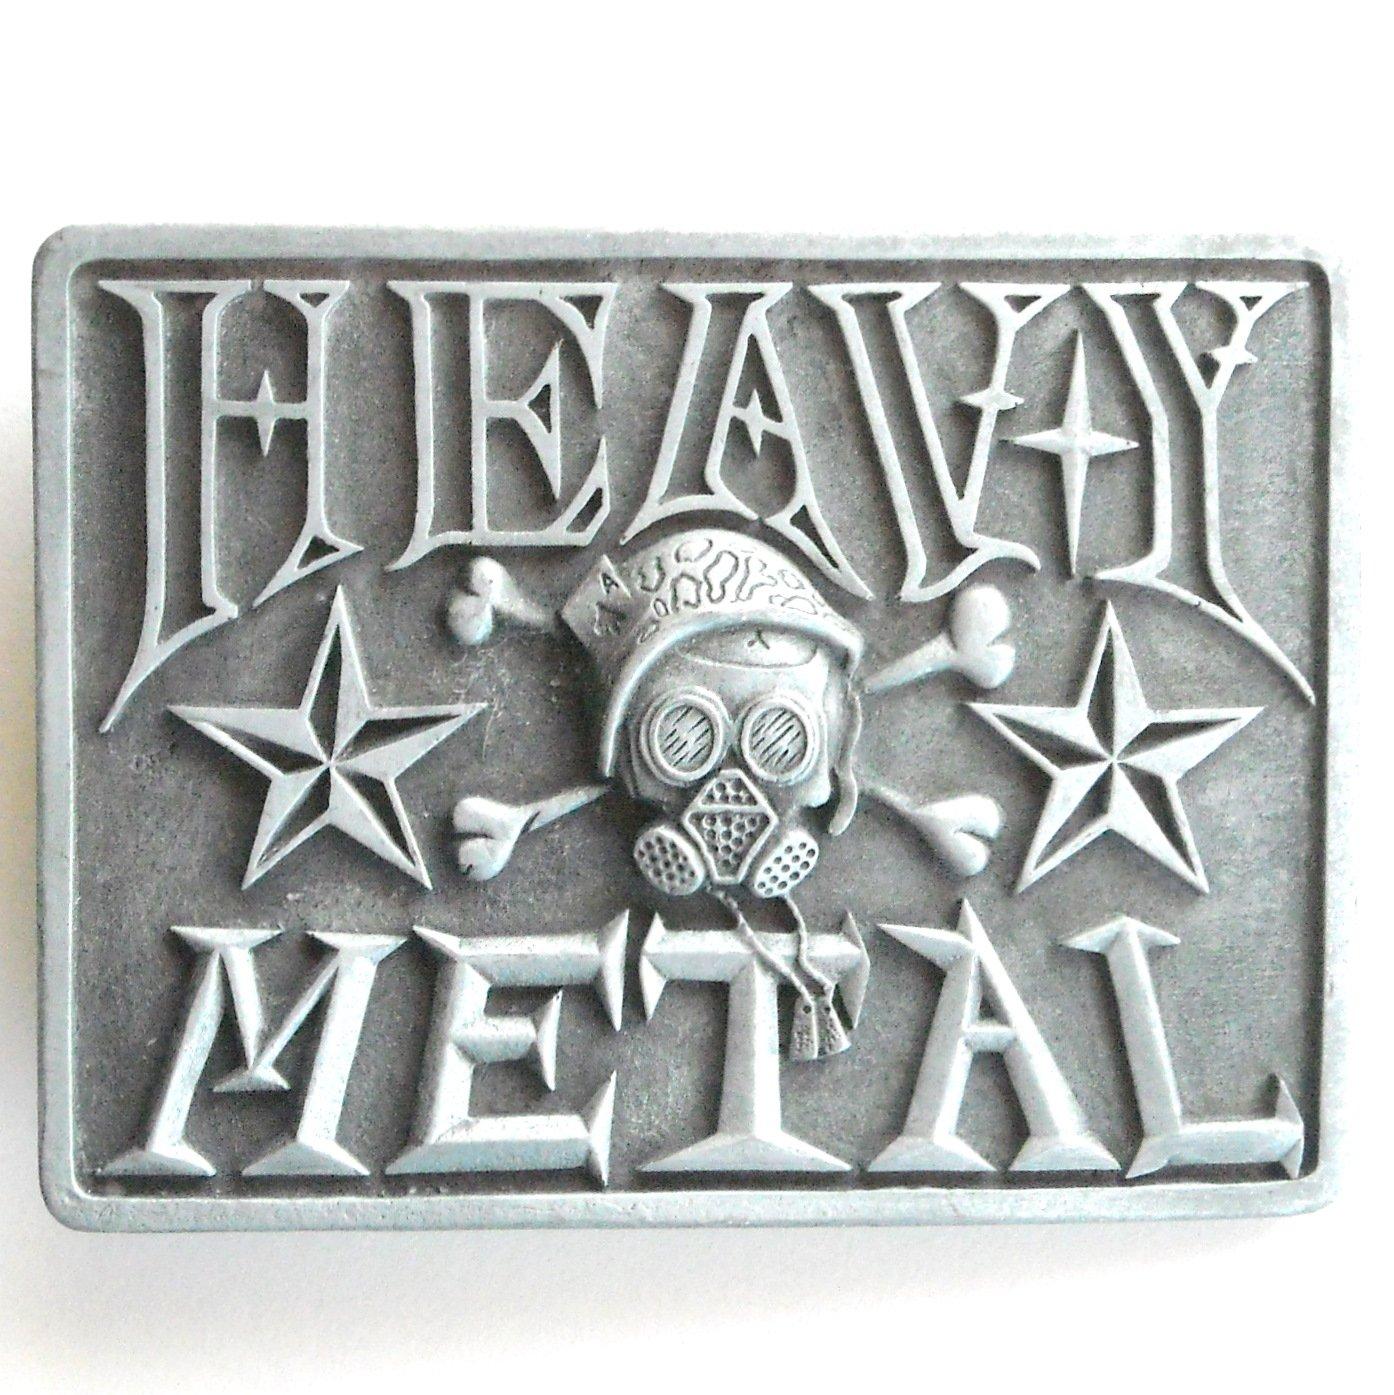 Heavy Metal Pewter Gray Rectangle Metal Belt Buckle